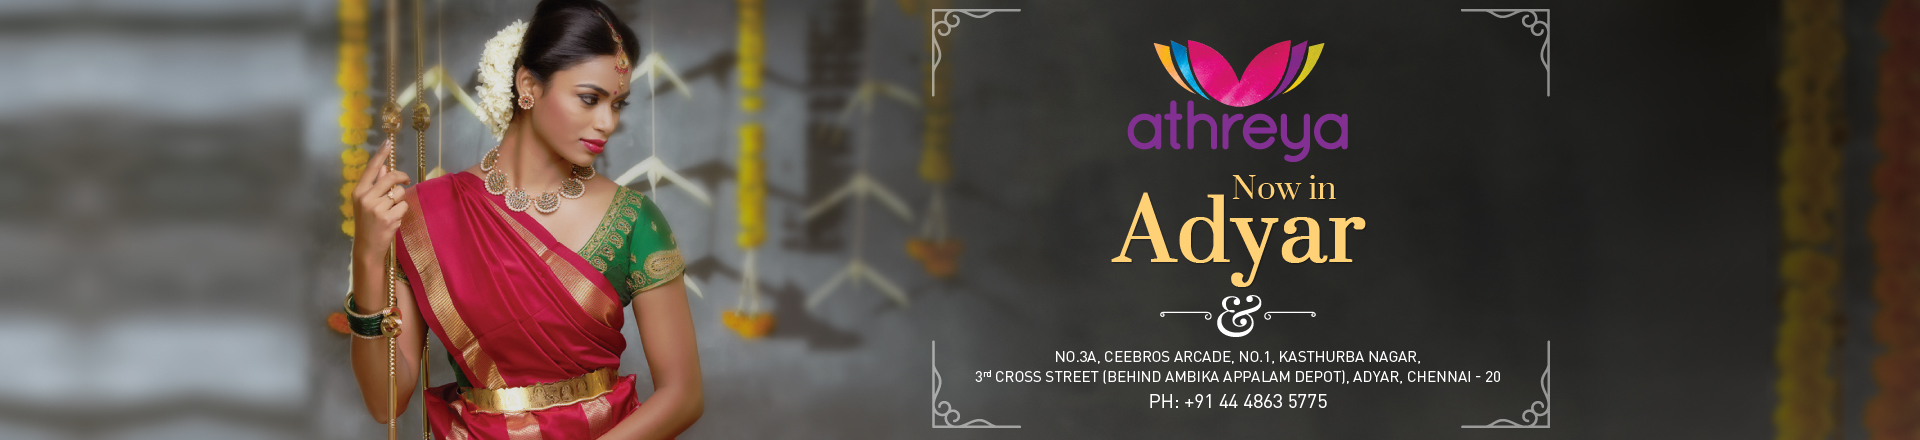 Athreya Blouses Adyar Shop